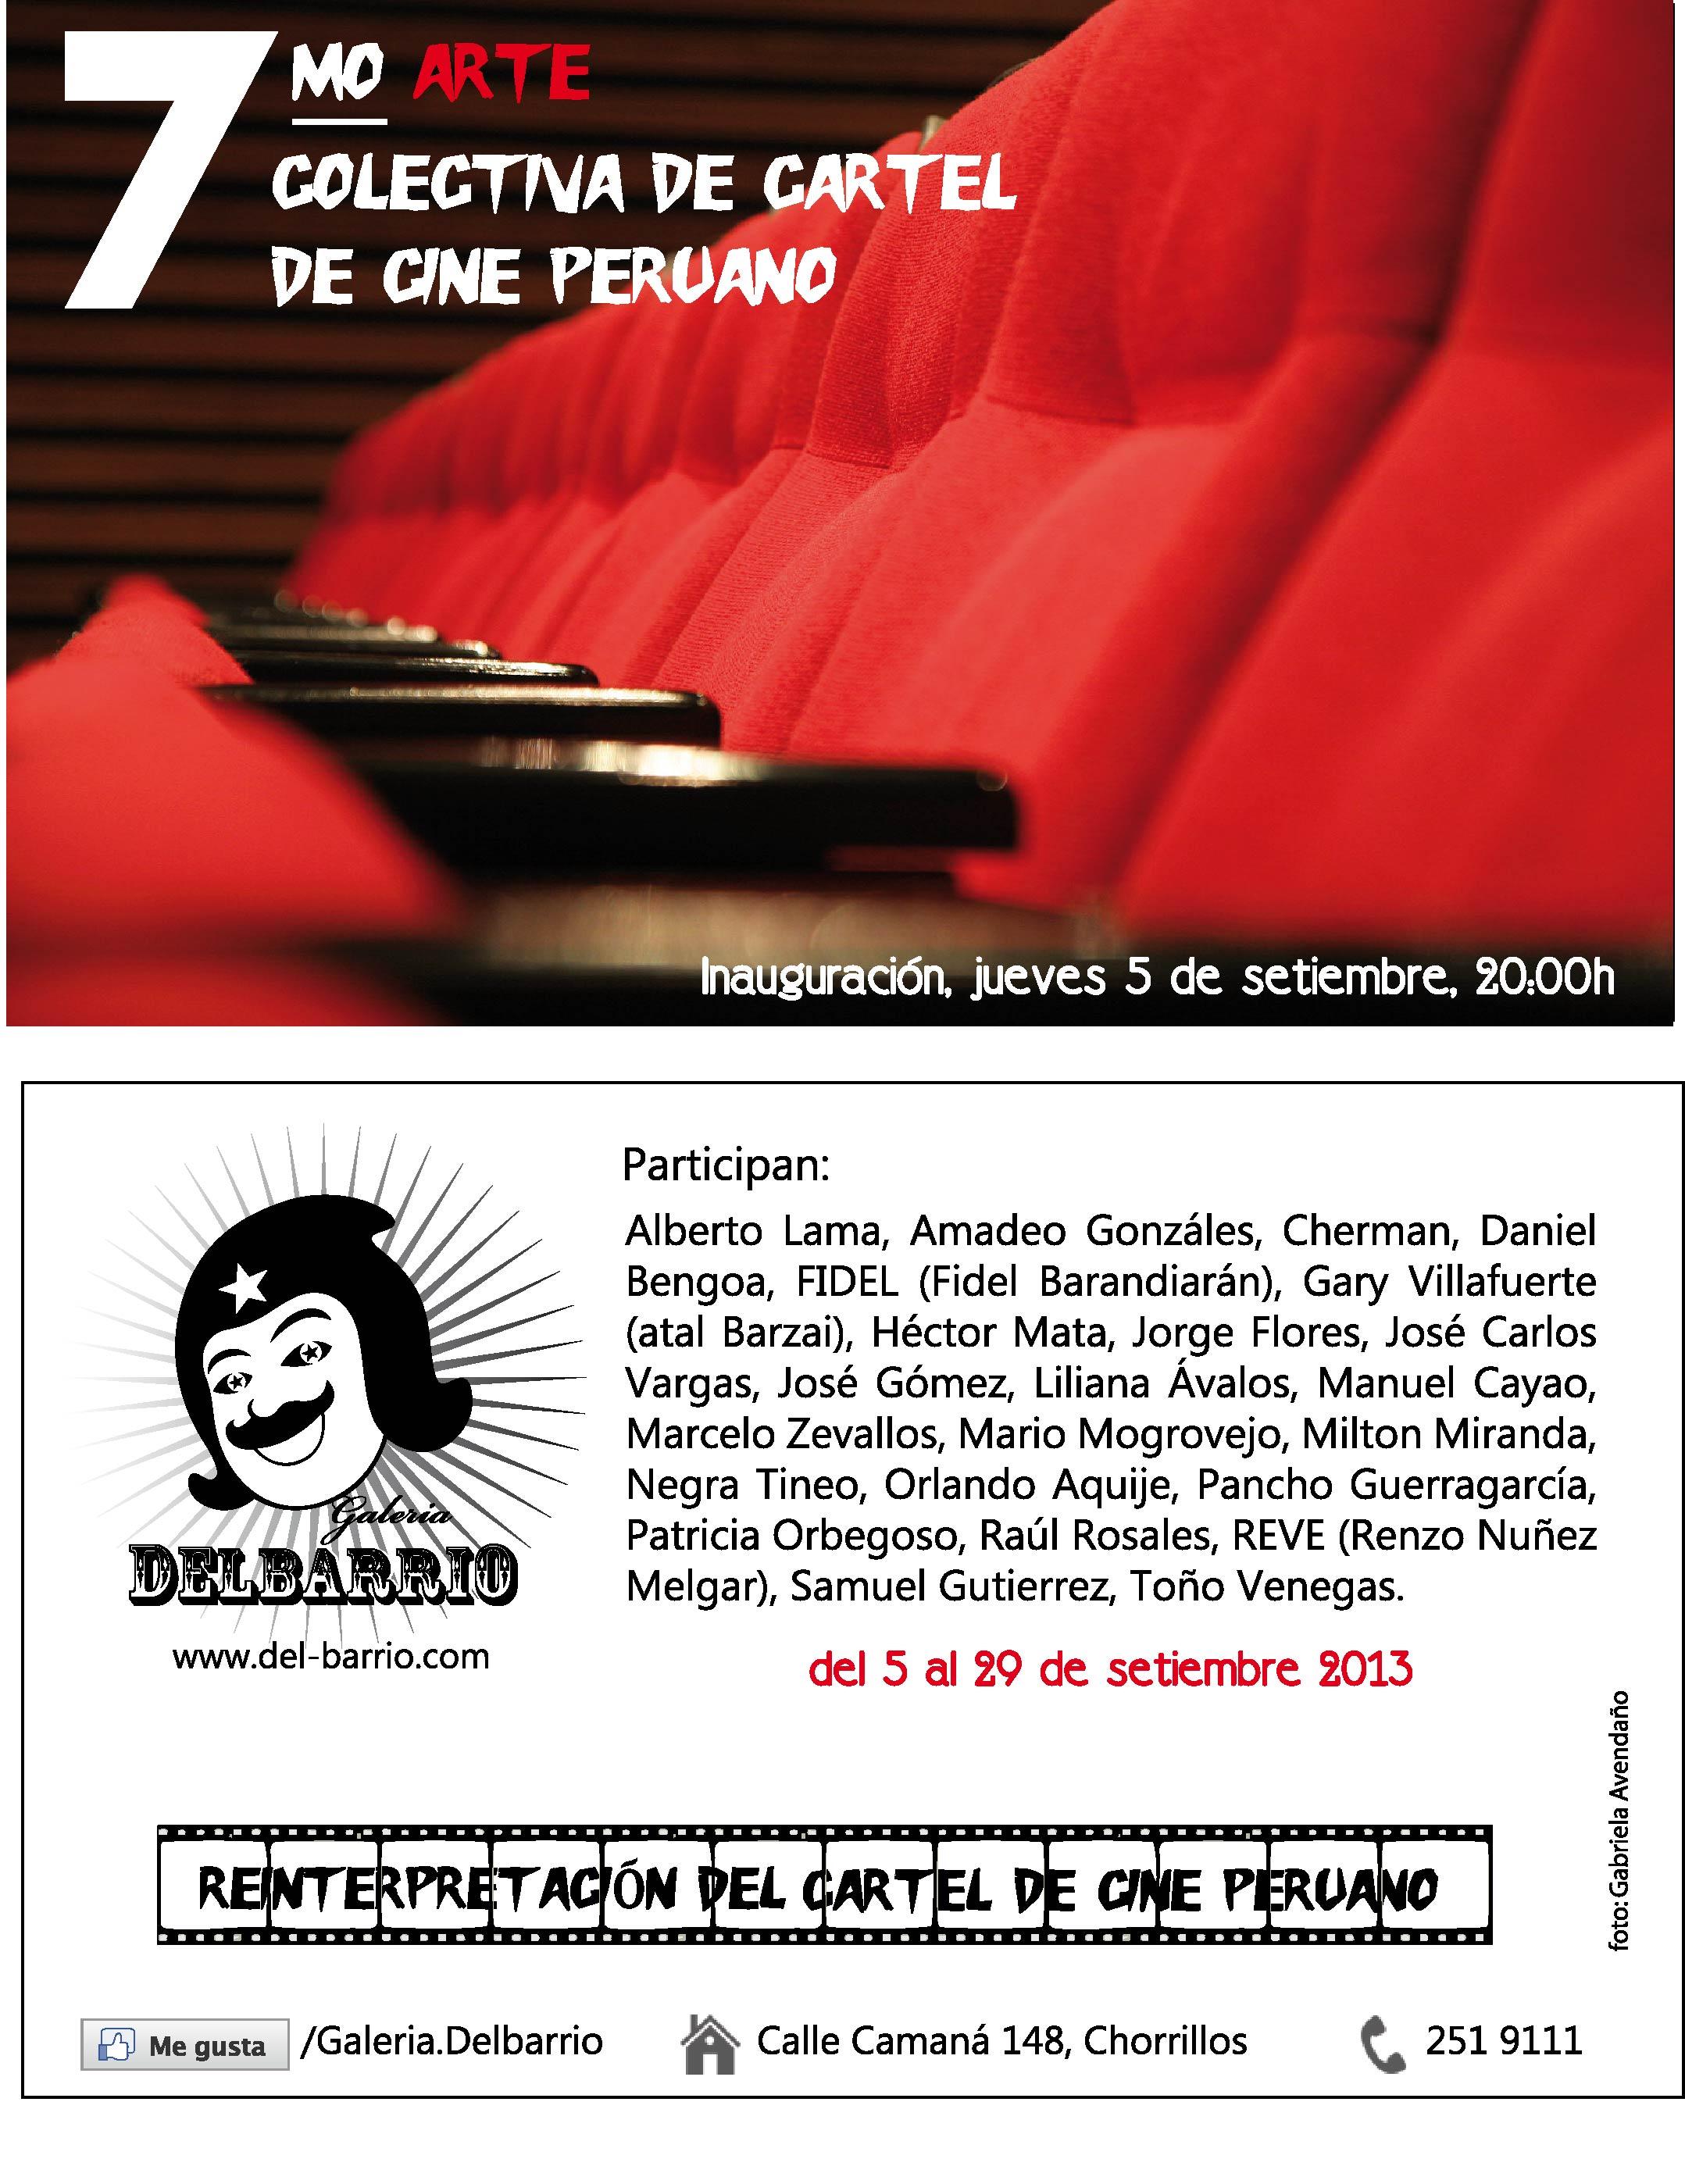 Cartel de Cine peruano